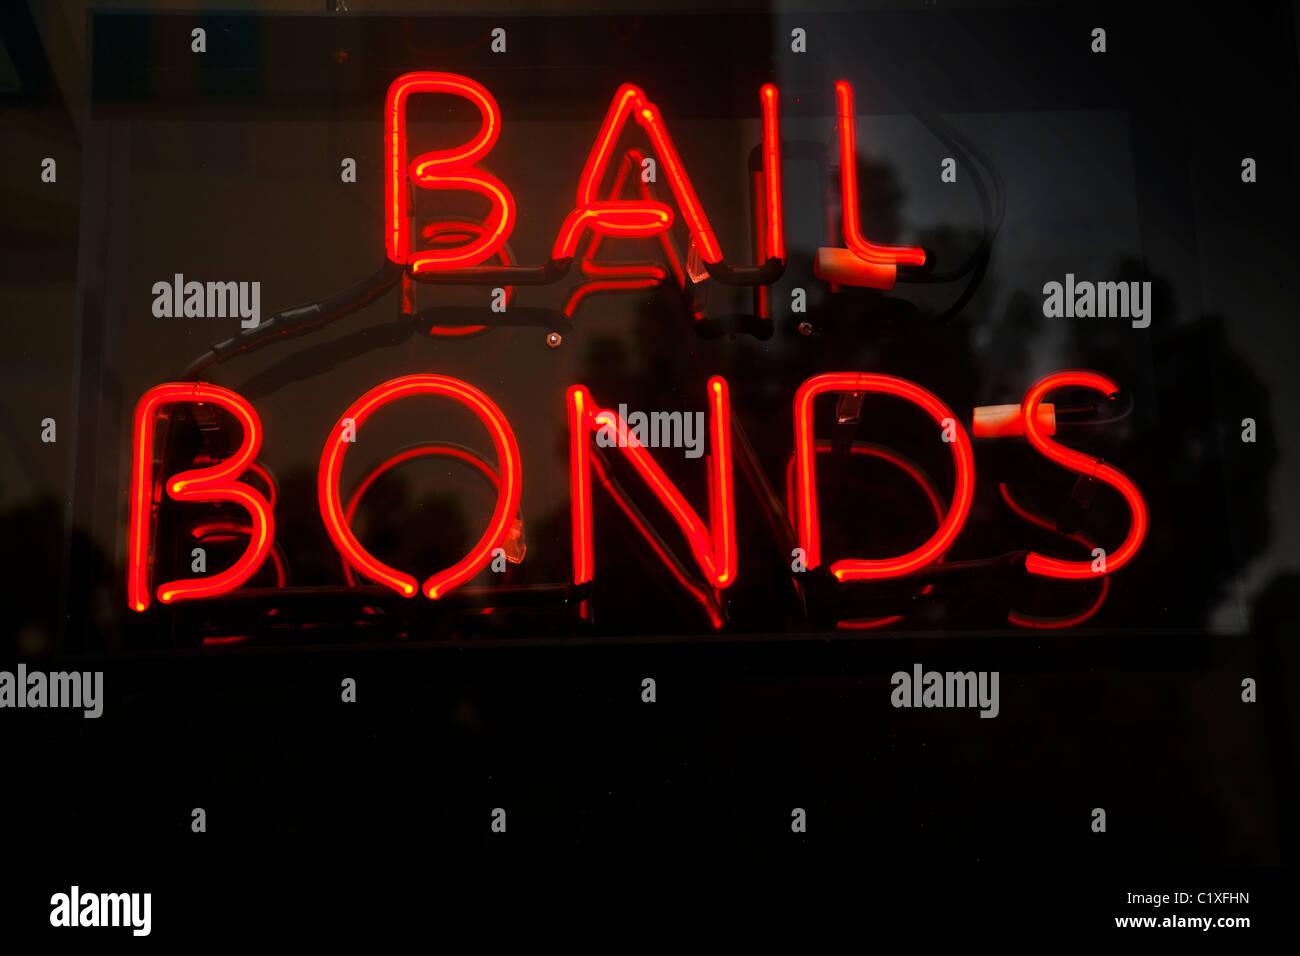 Neon bail bonds sign - Stock Image